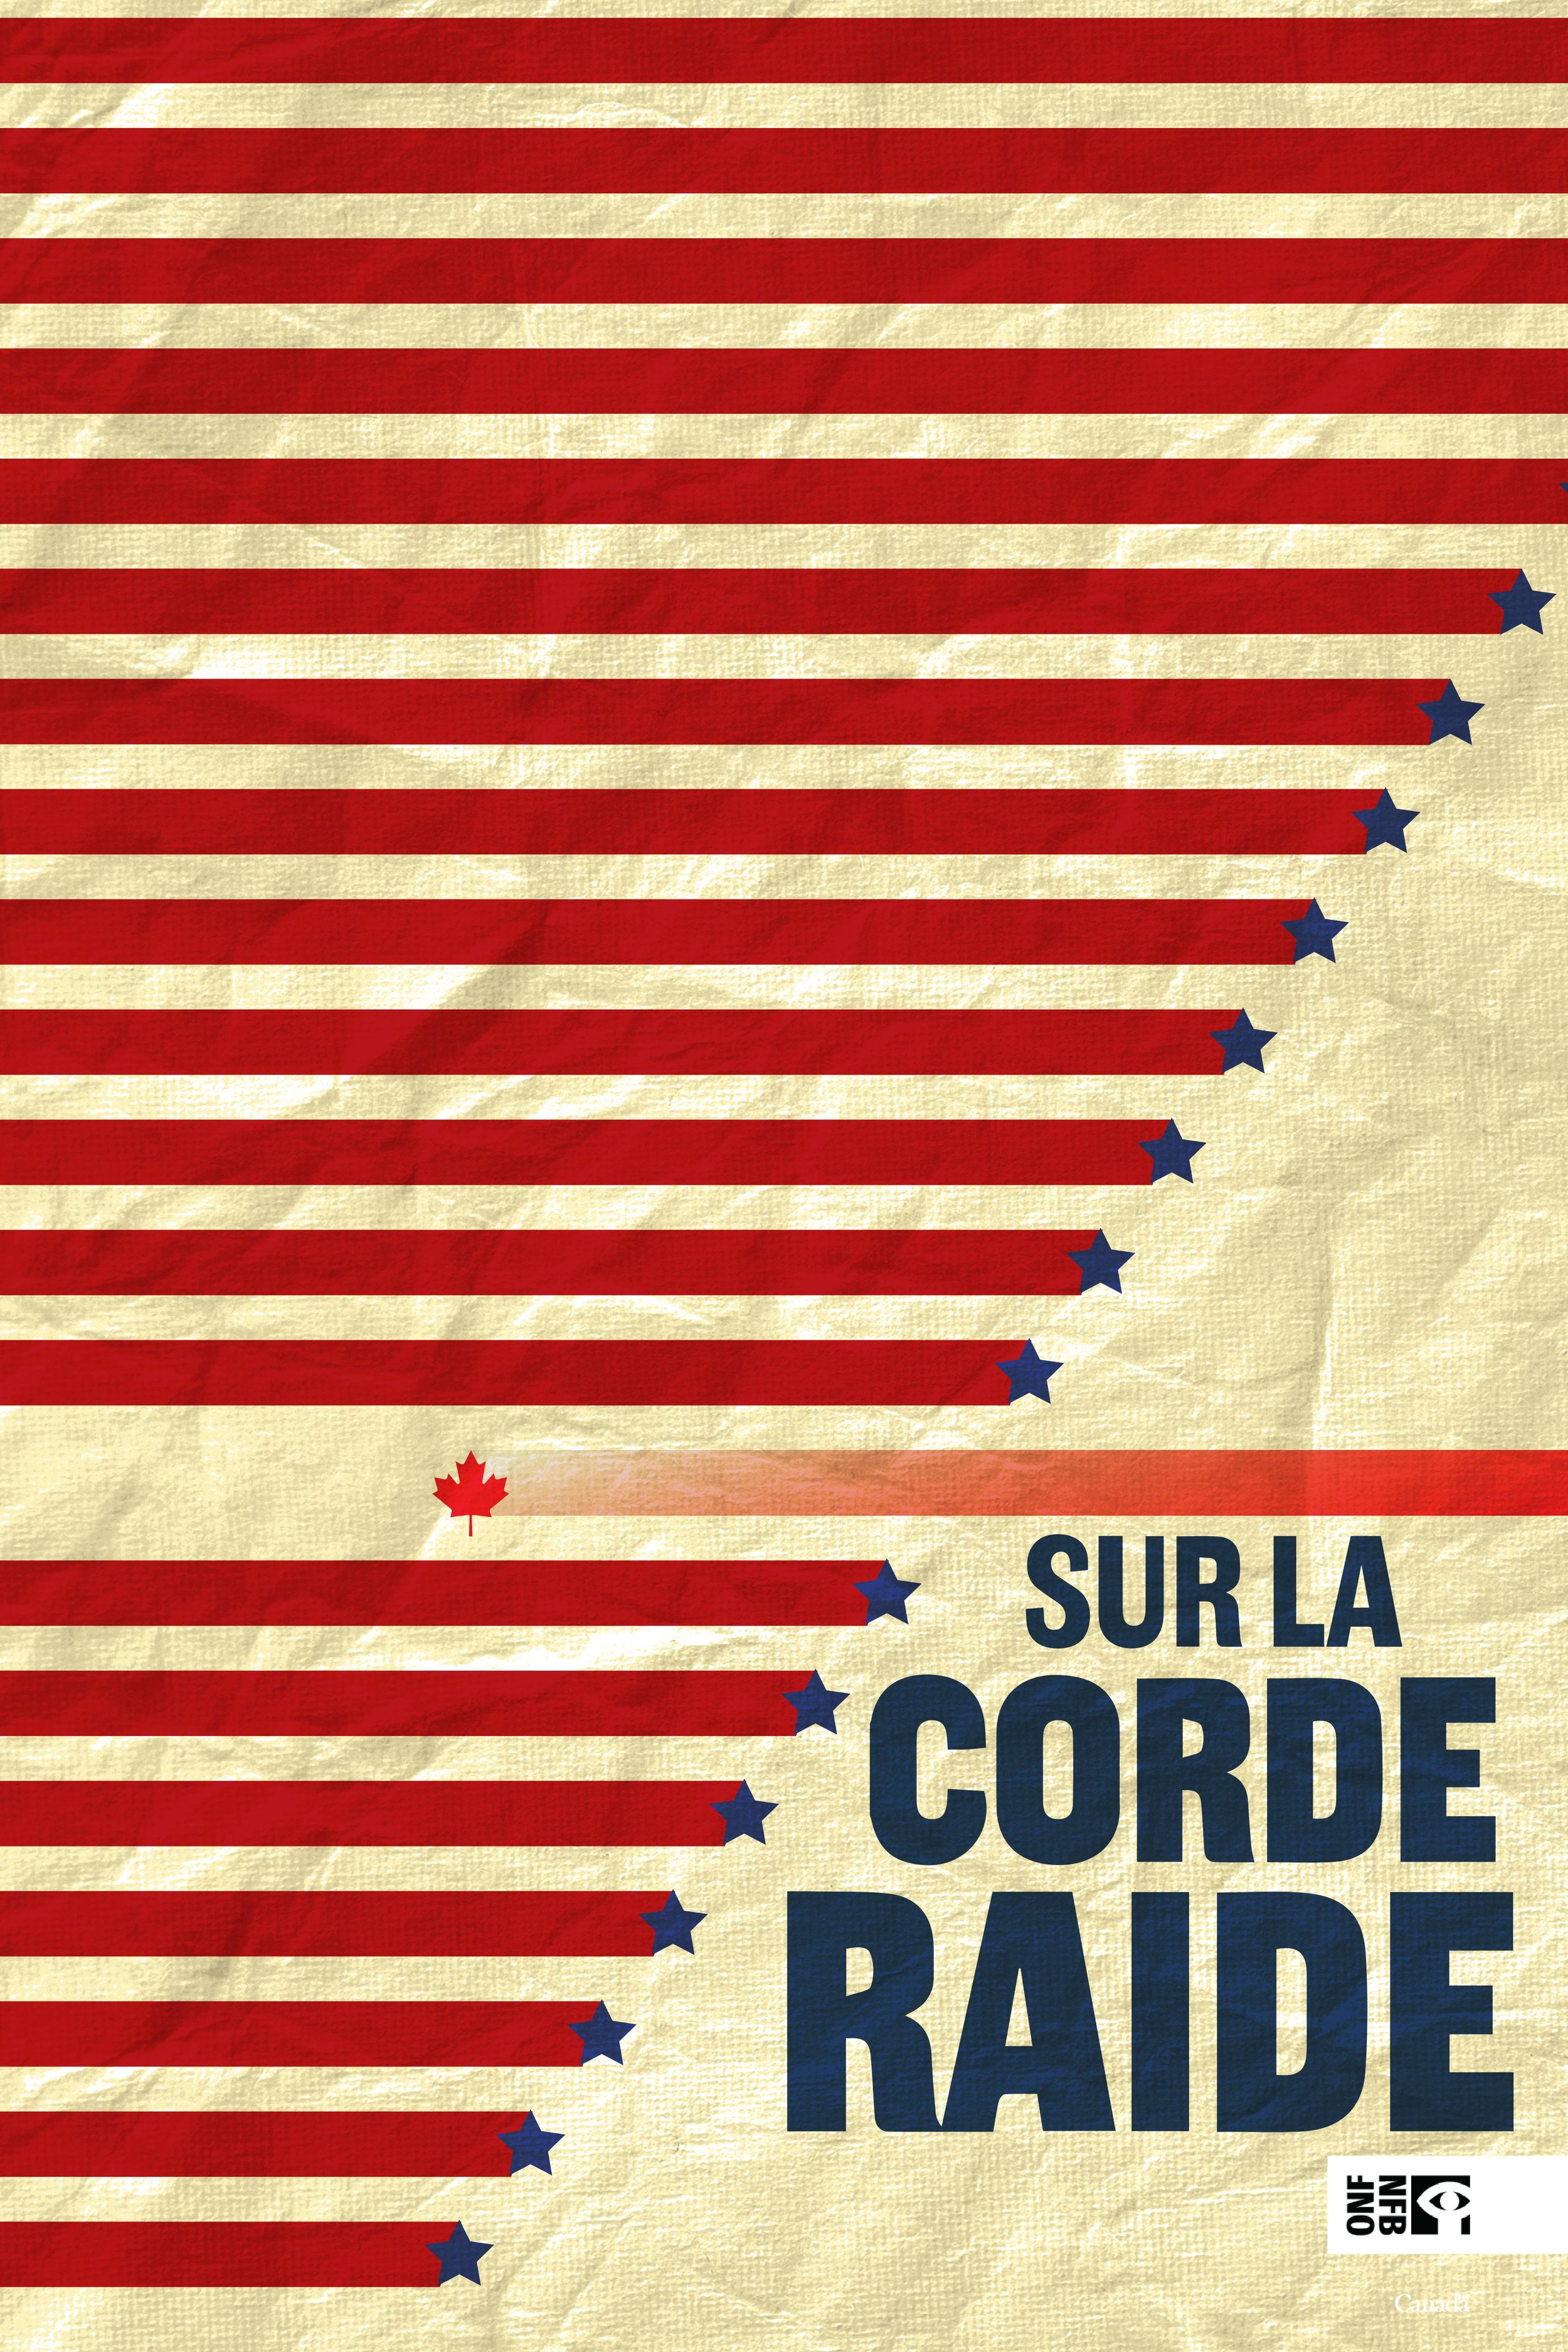 SURLACORDERAIDE-LaCamaraderie-Poster-1mars-01 (1)_00008.jpg